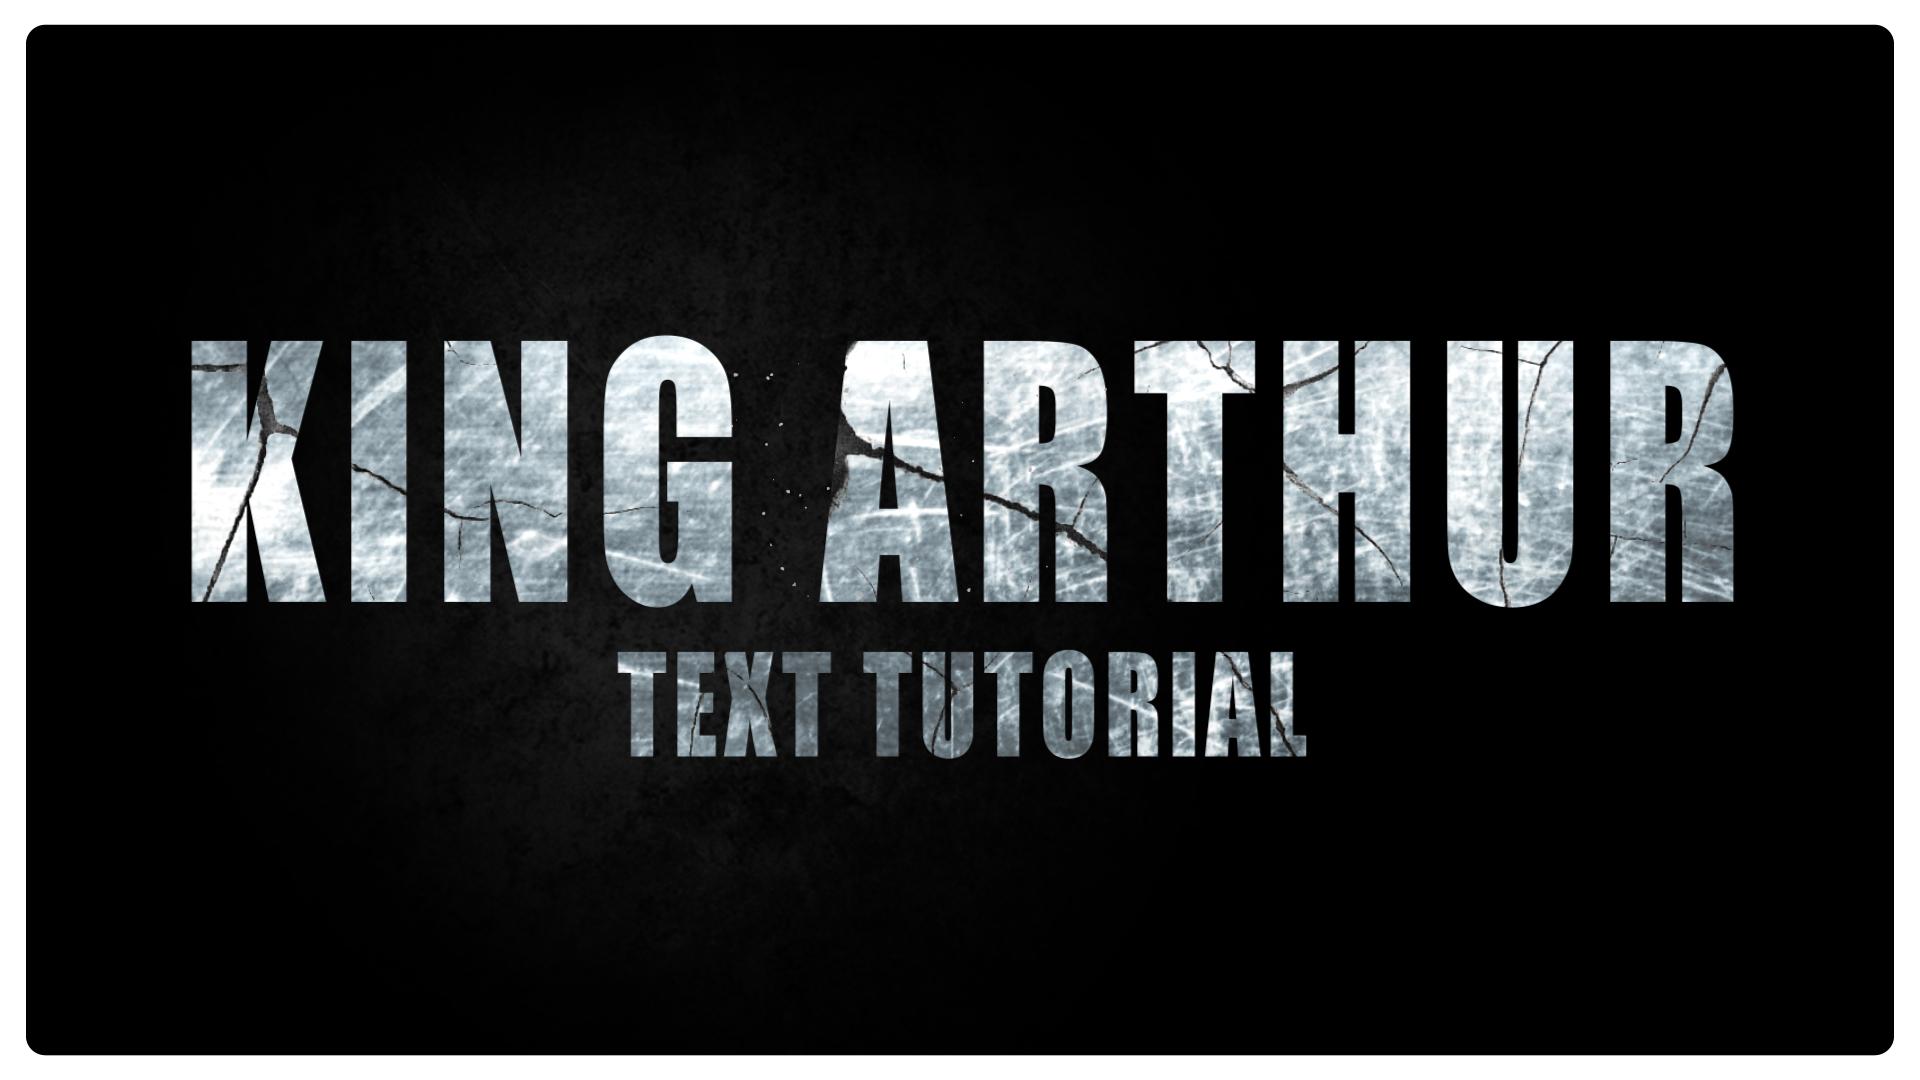 King Arthur text tutorial